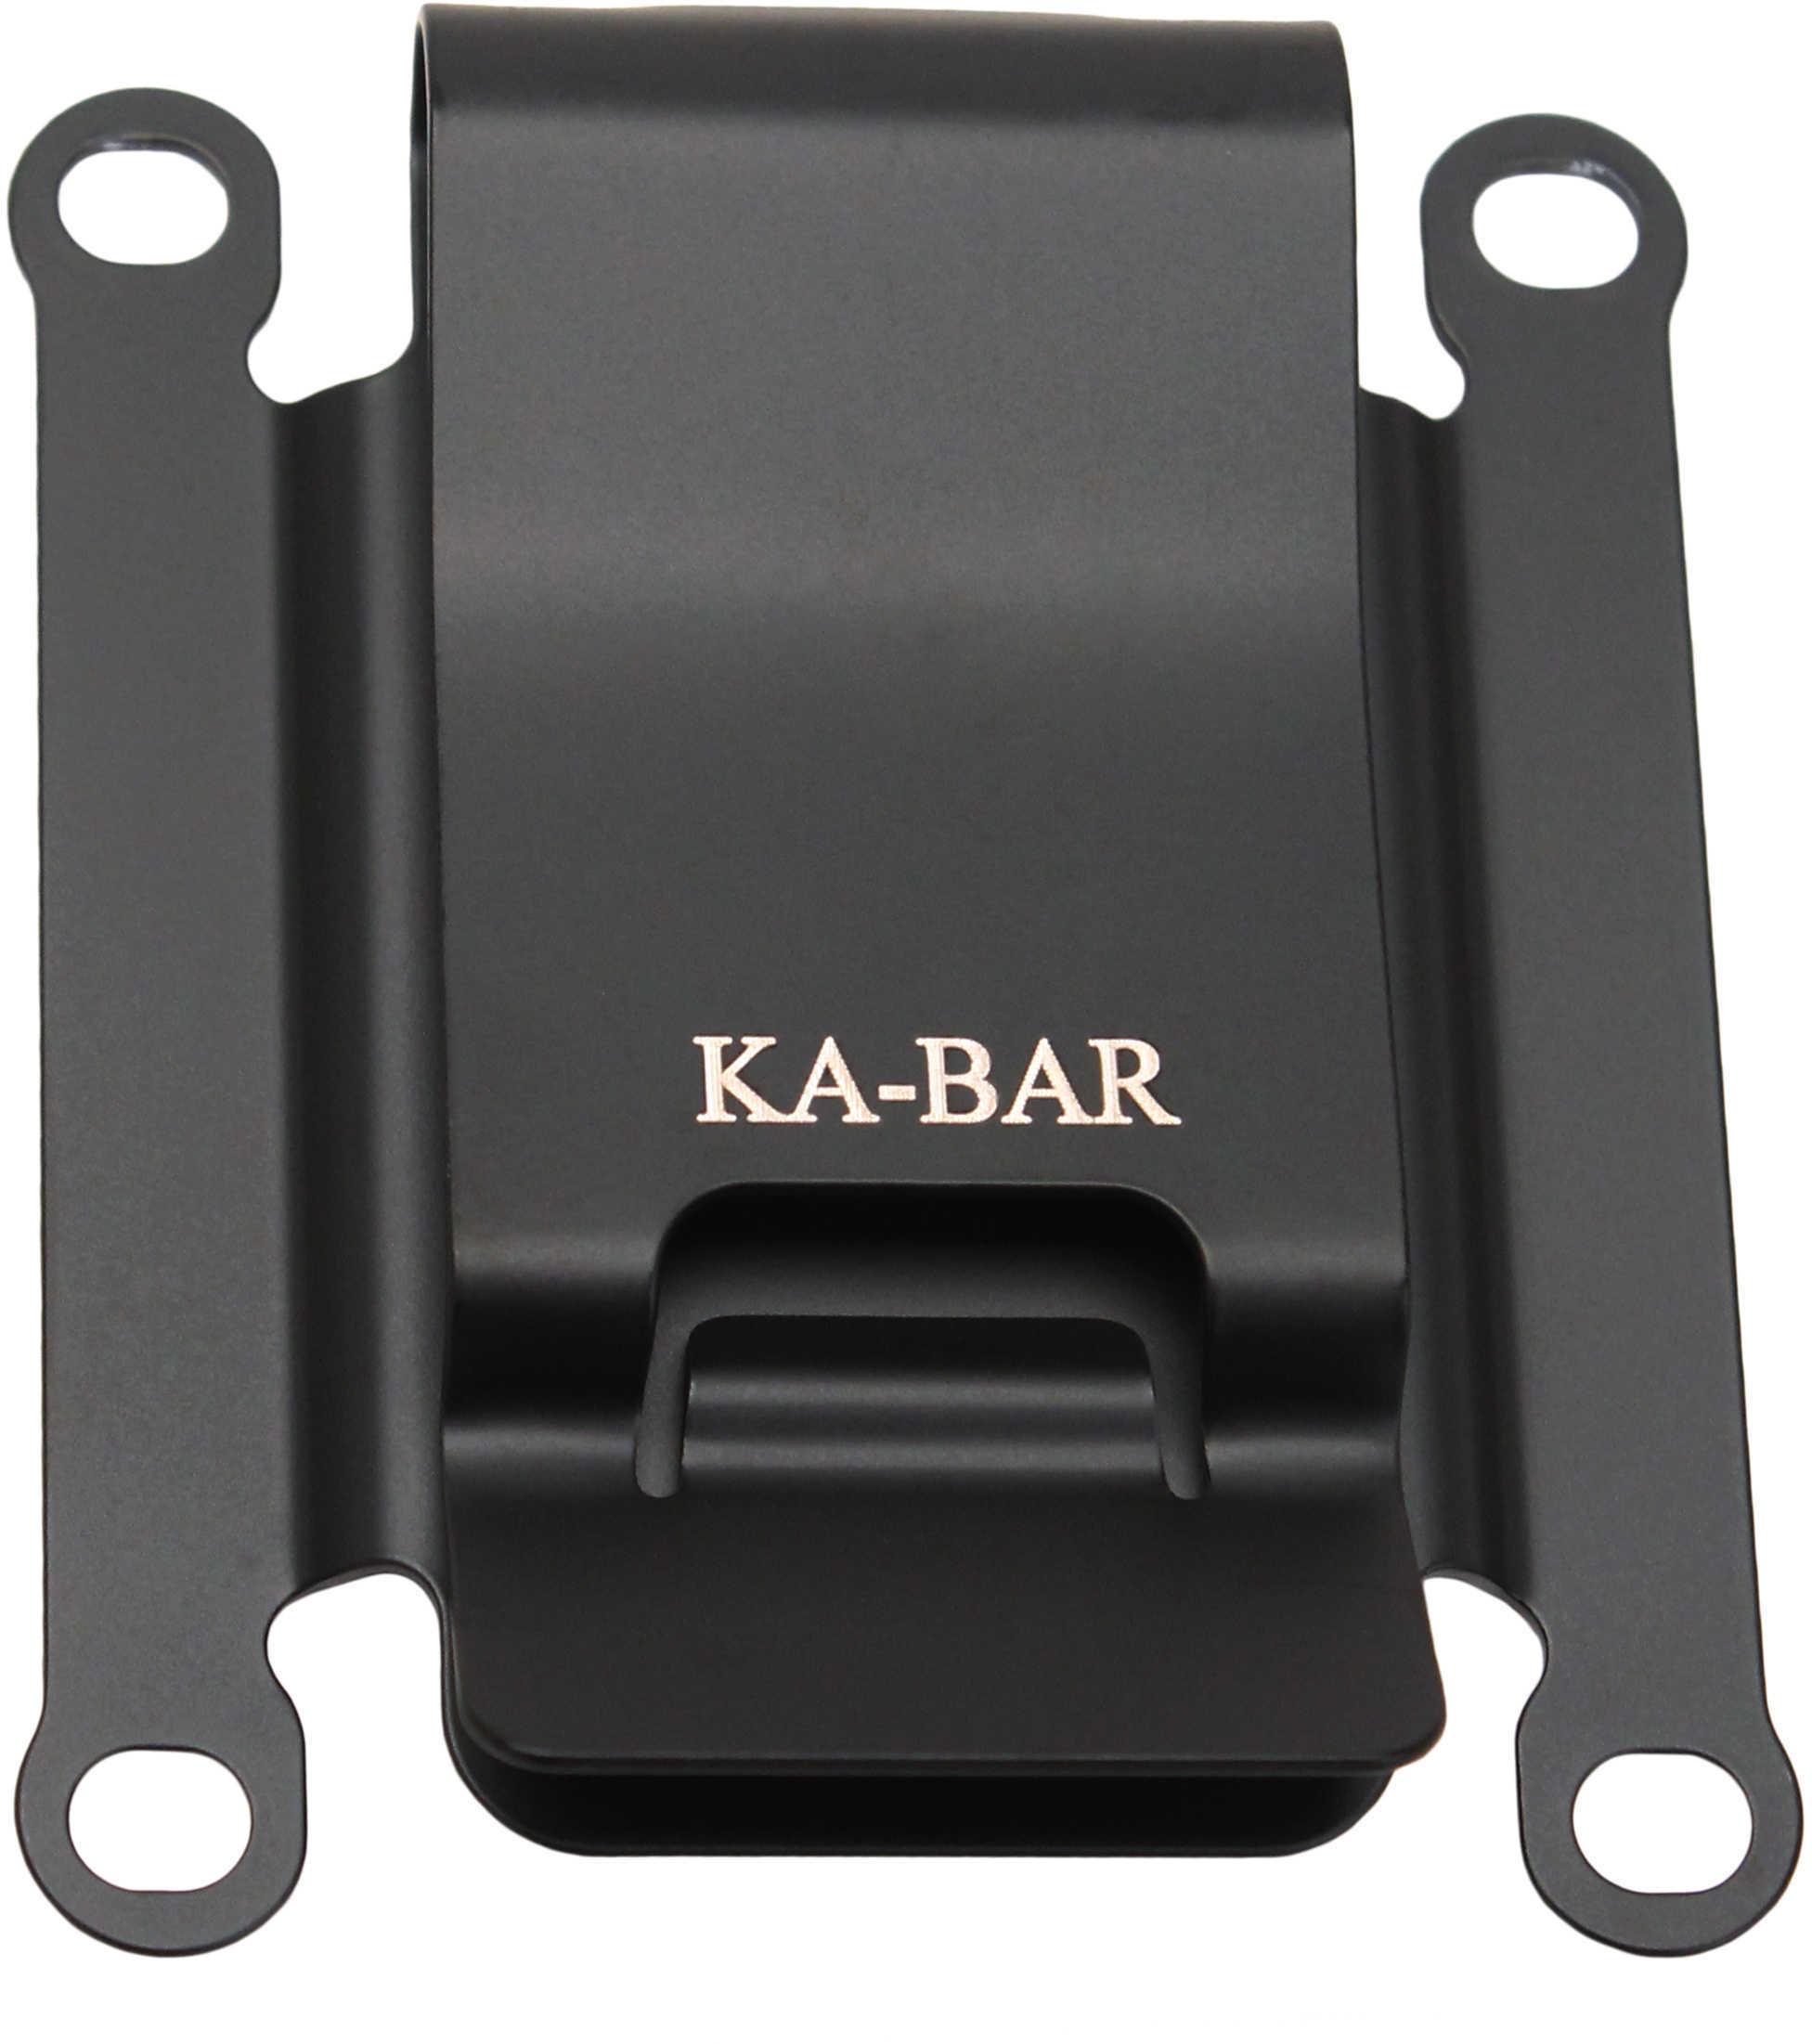 Kabar Clip For TDI Law Enforcement Knife Md: 1480Clip